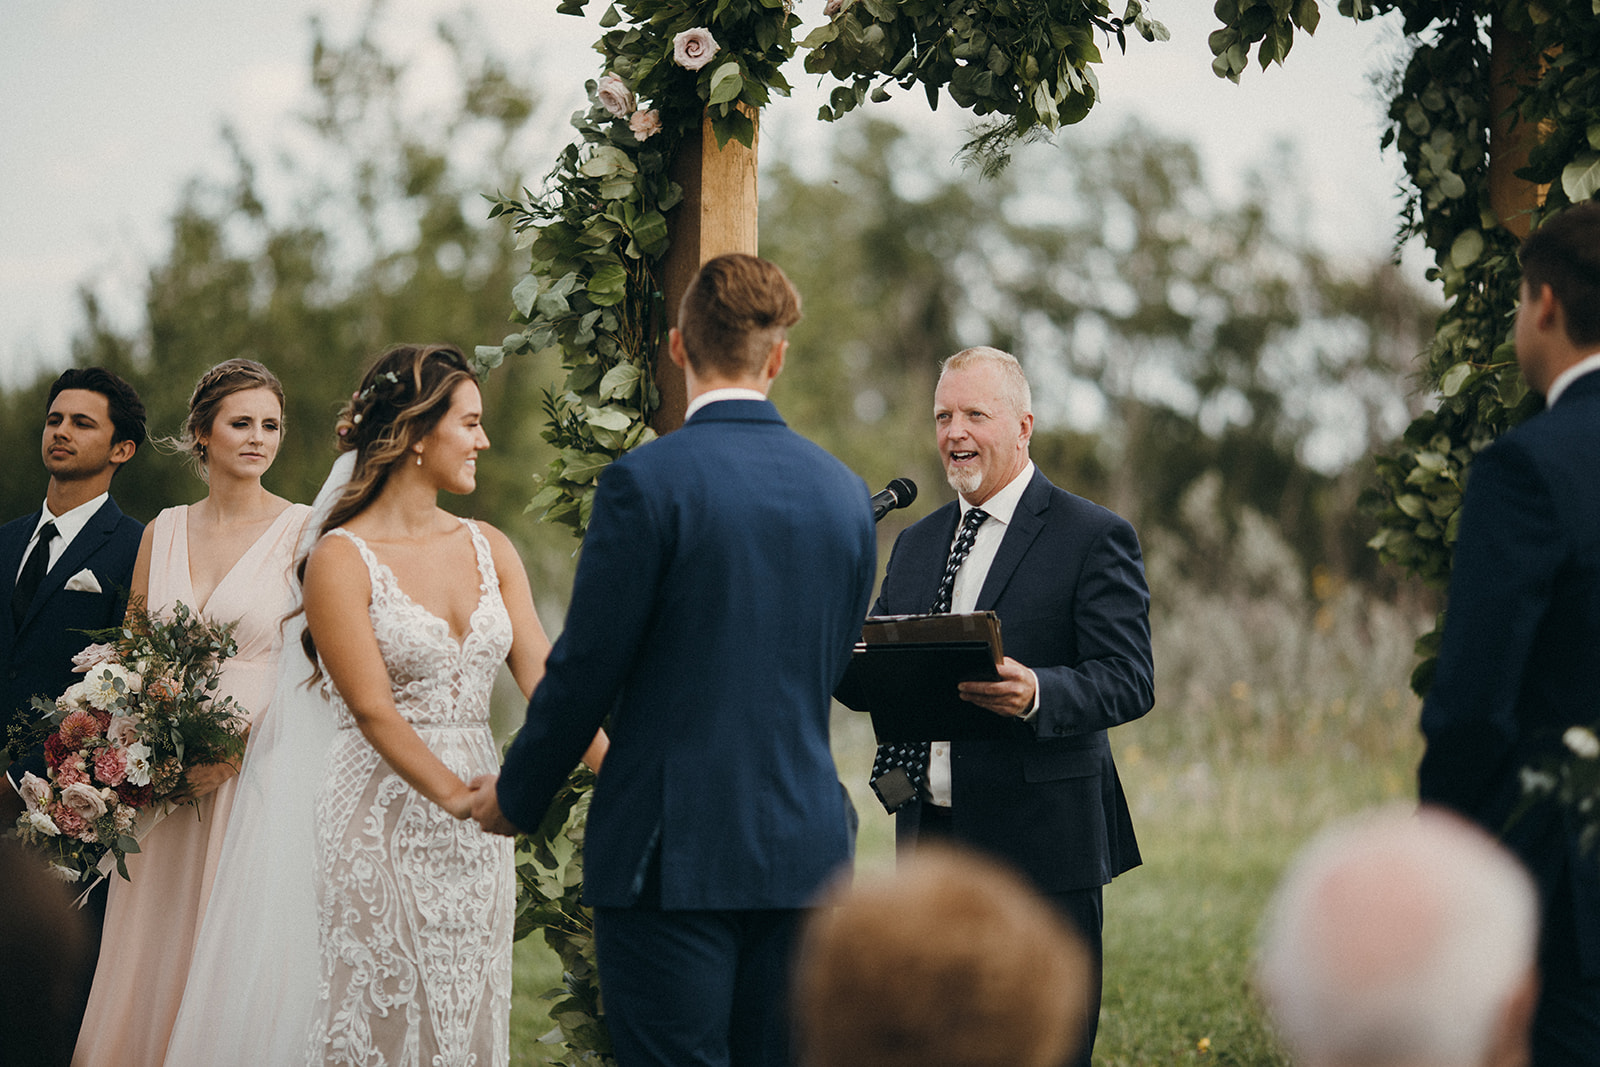 kaden_justine_wedding_3627.jpg